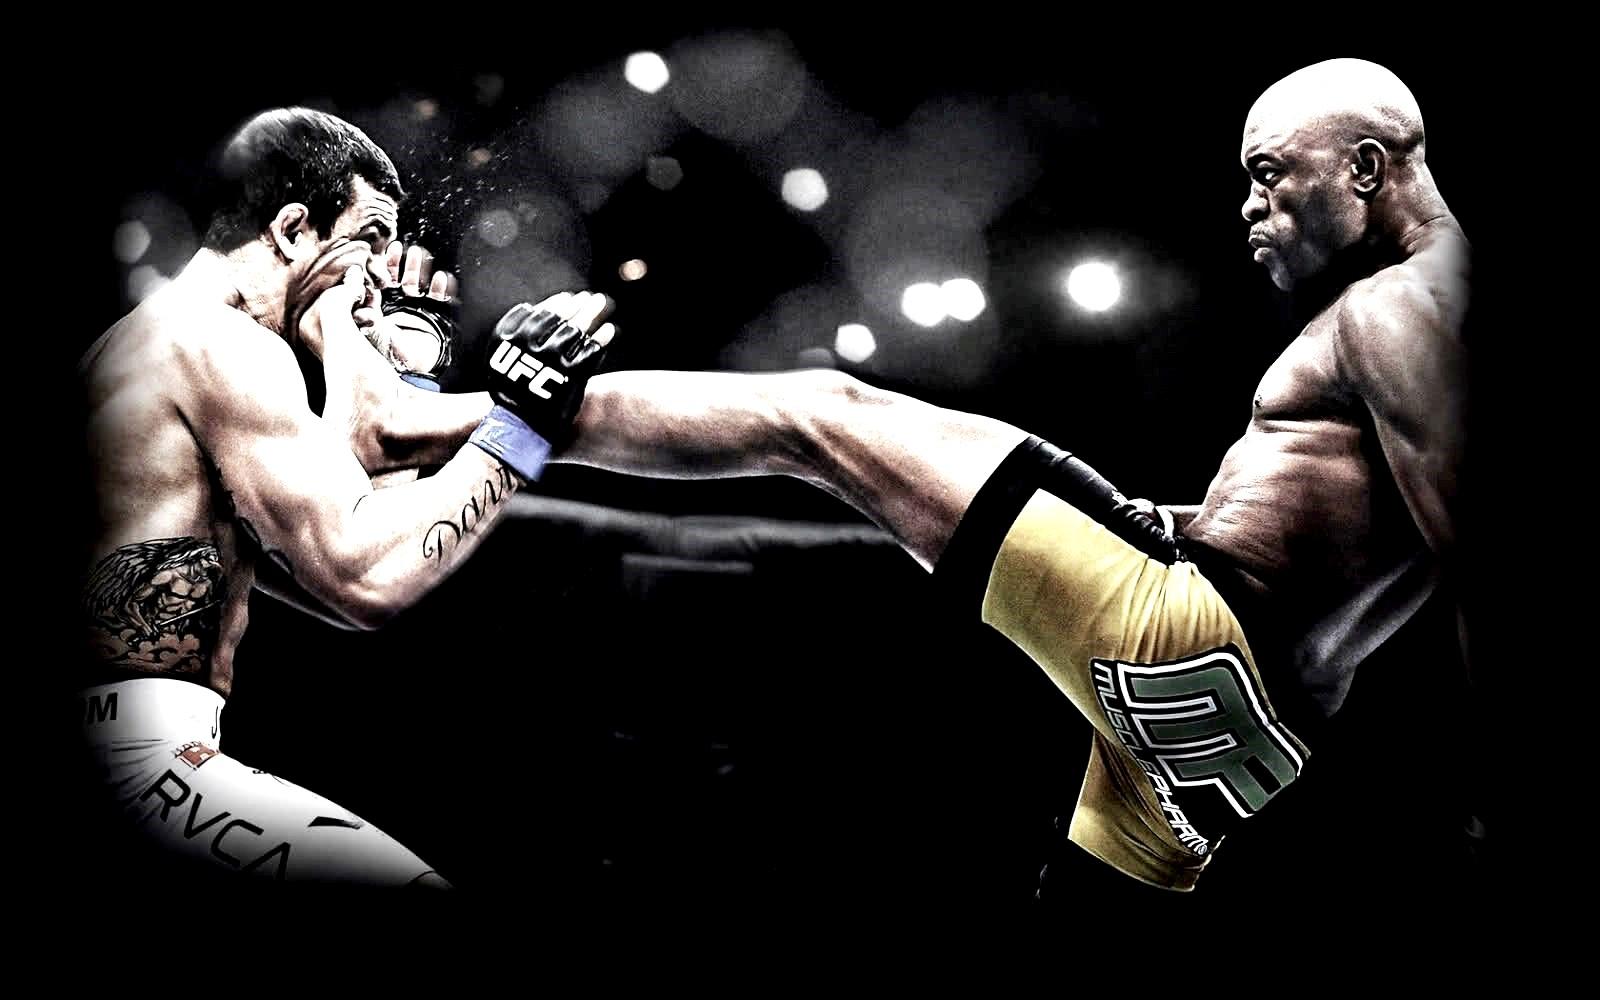 Jogos de boxe ufc